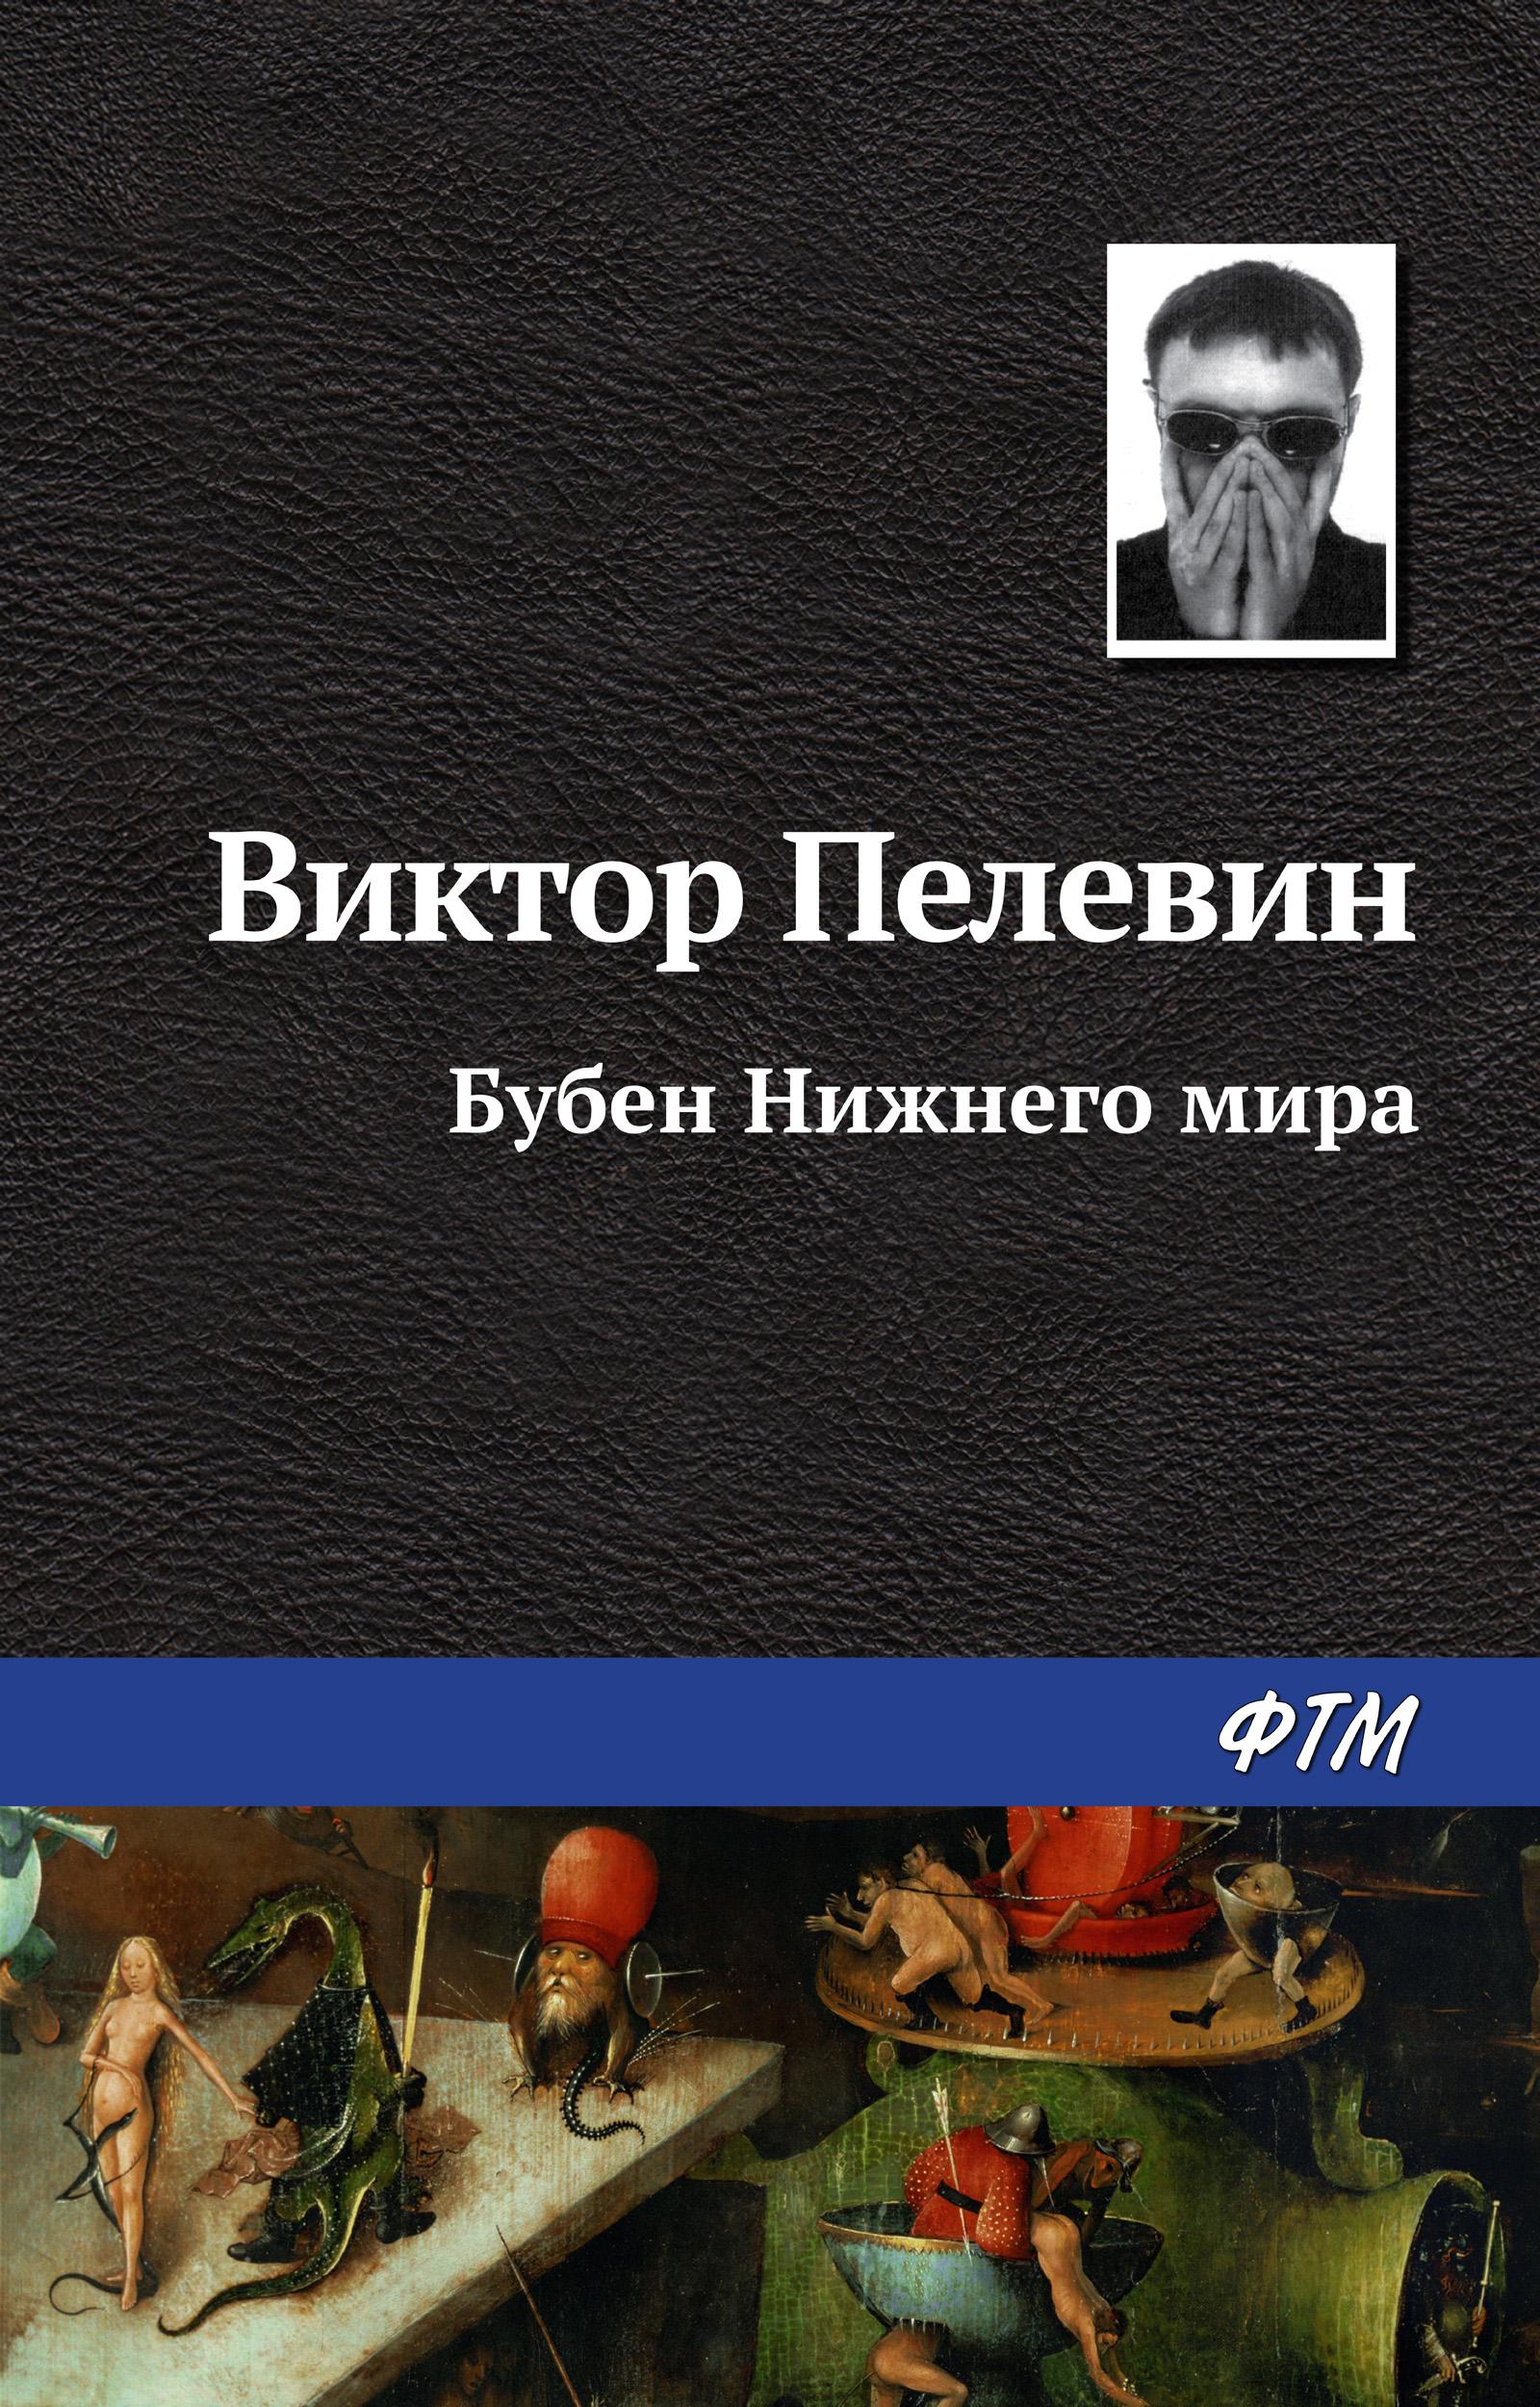 Виктор Пелевин Бубен Нижнего мира виктор пелевин бубен верхнего мира истории и рассказы